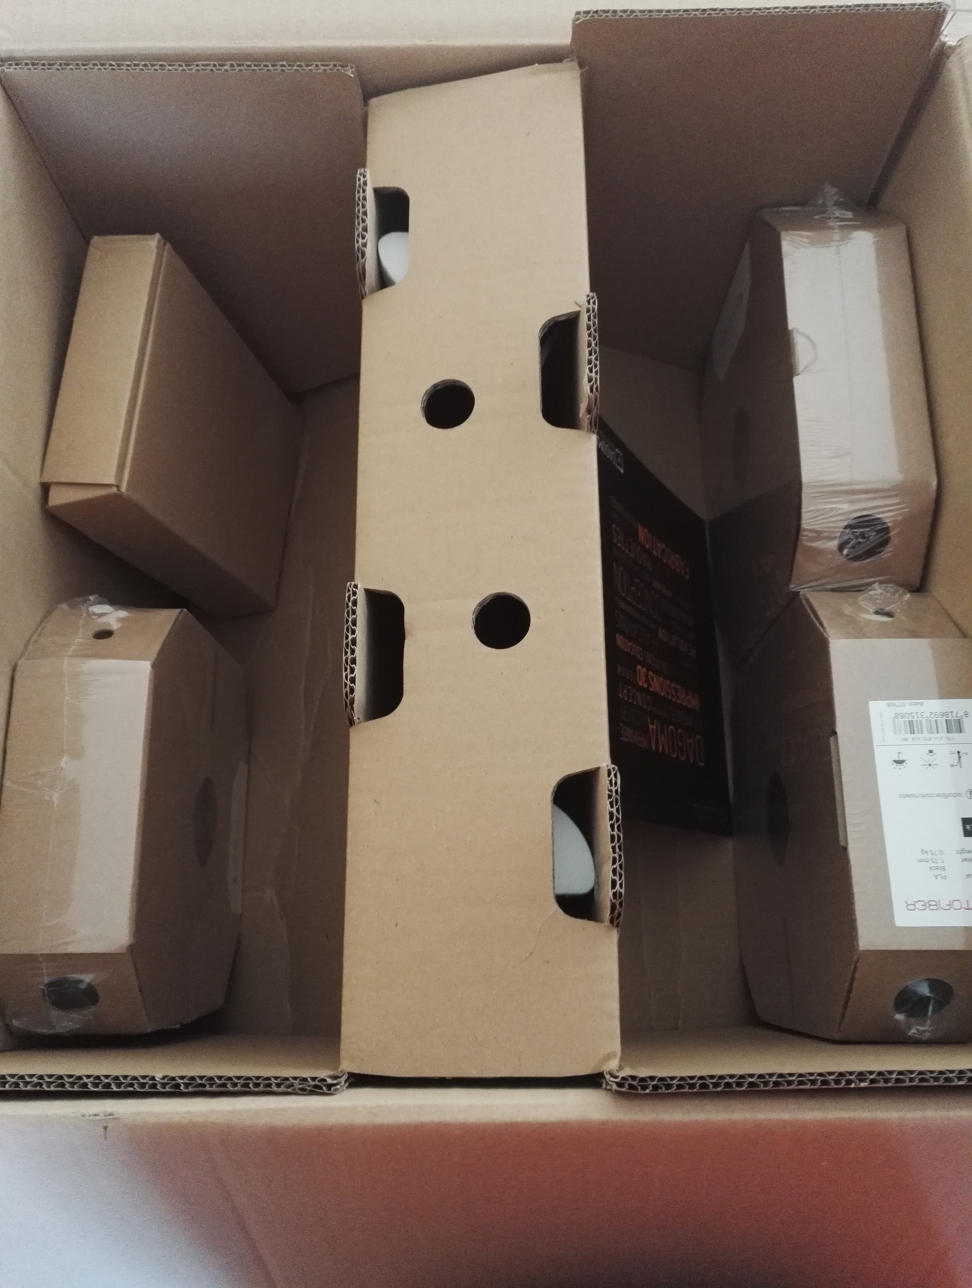 Emballage Imprimante Et Accessoires.jpg